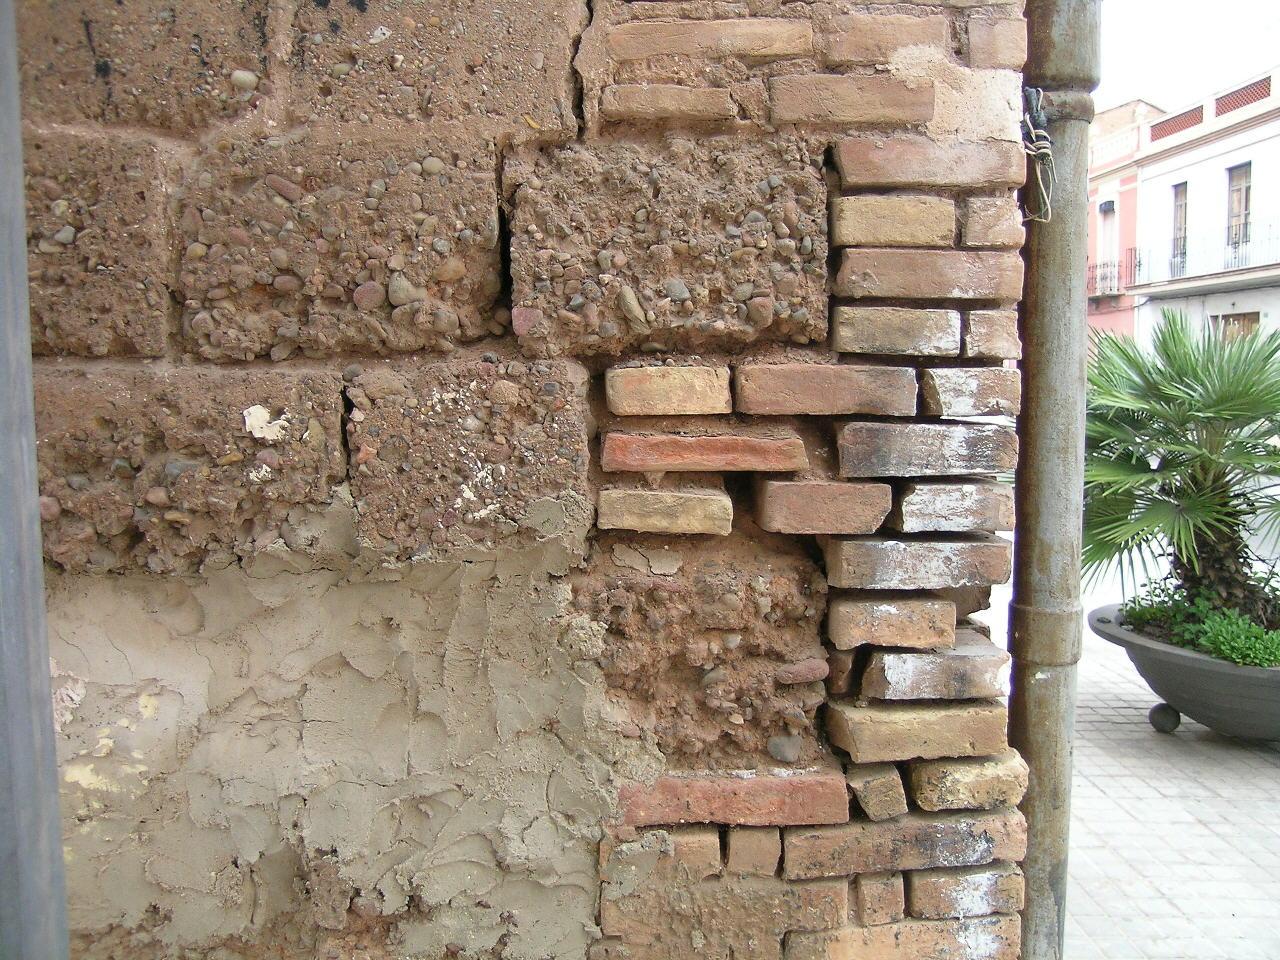 Bosco hurtado arquitecto restauraci n muros de tapial for Mortero para ladrillos